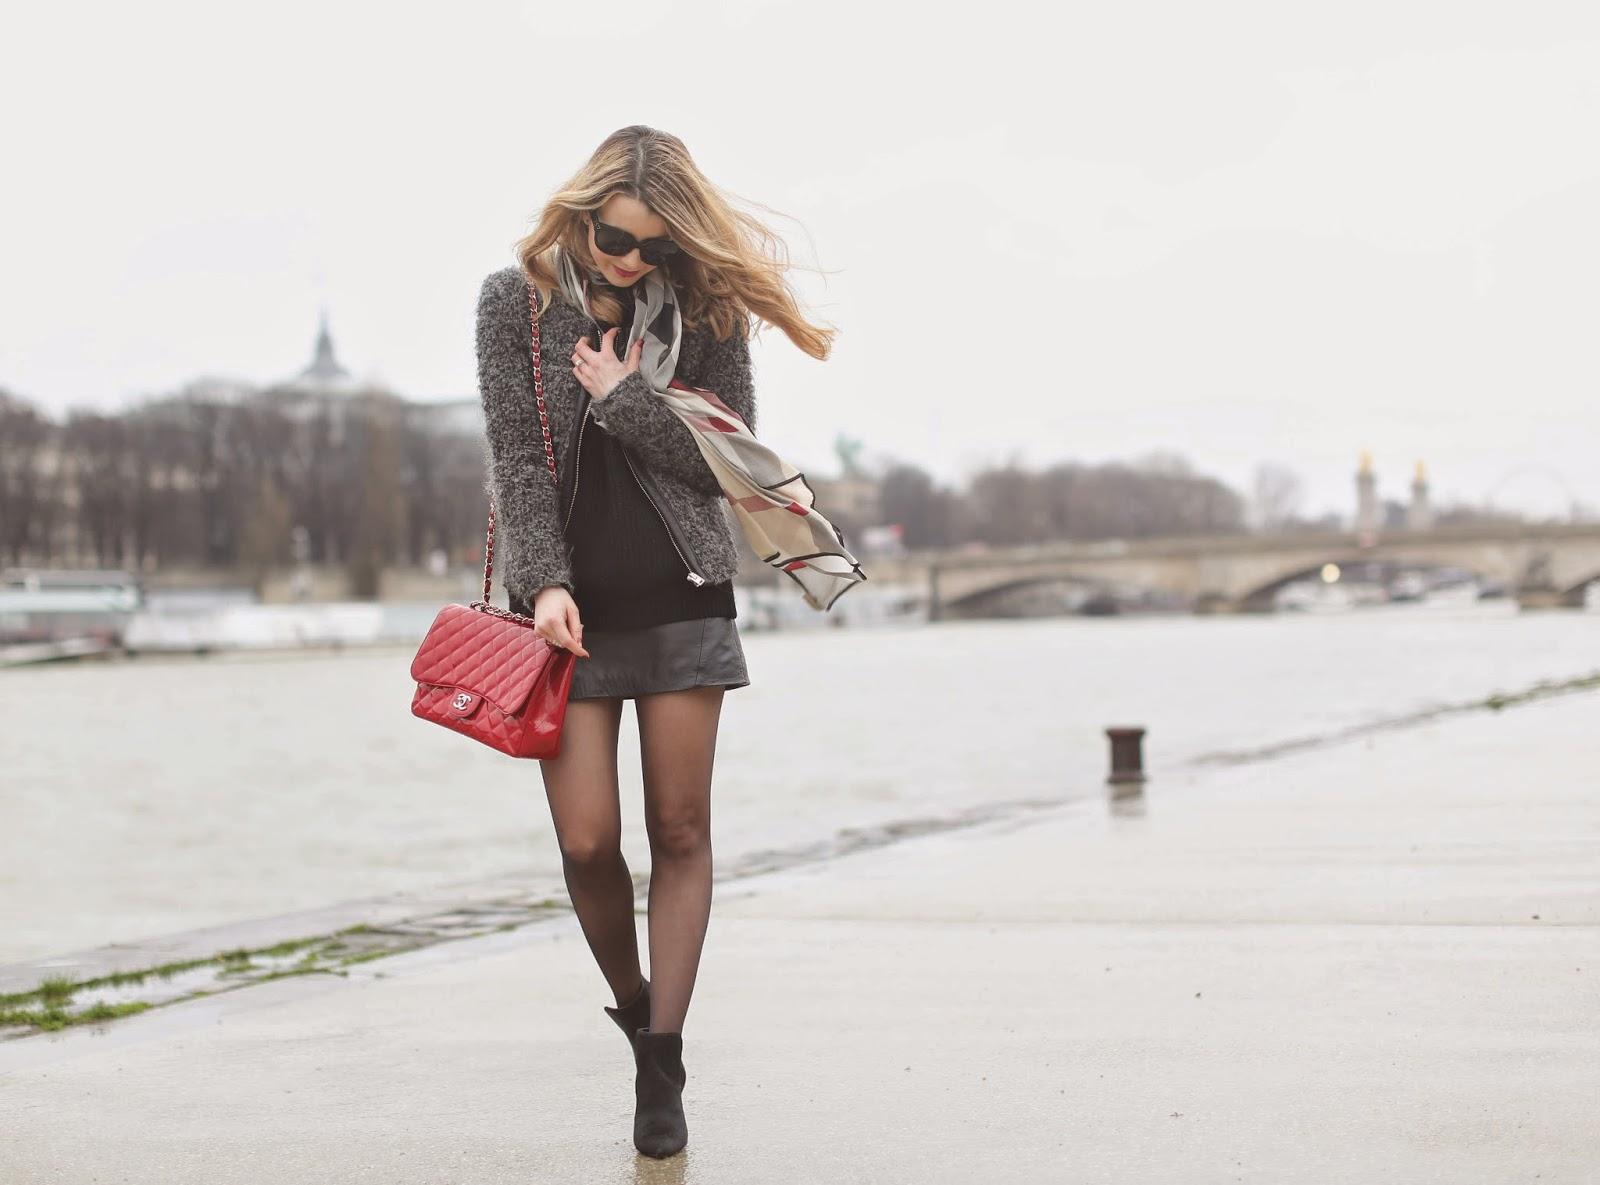 chanel, iro, topshop, paris, streetstyle, rainy days, fashion blogger